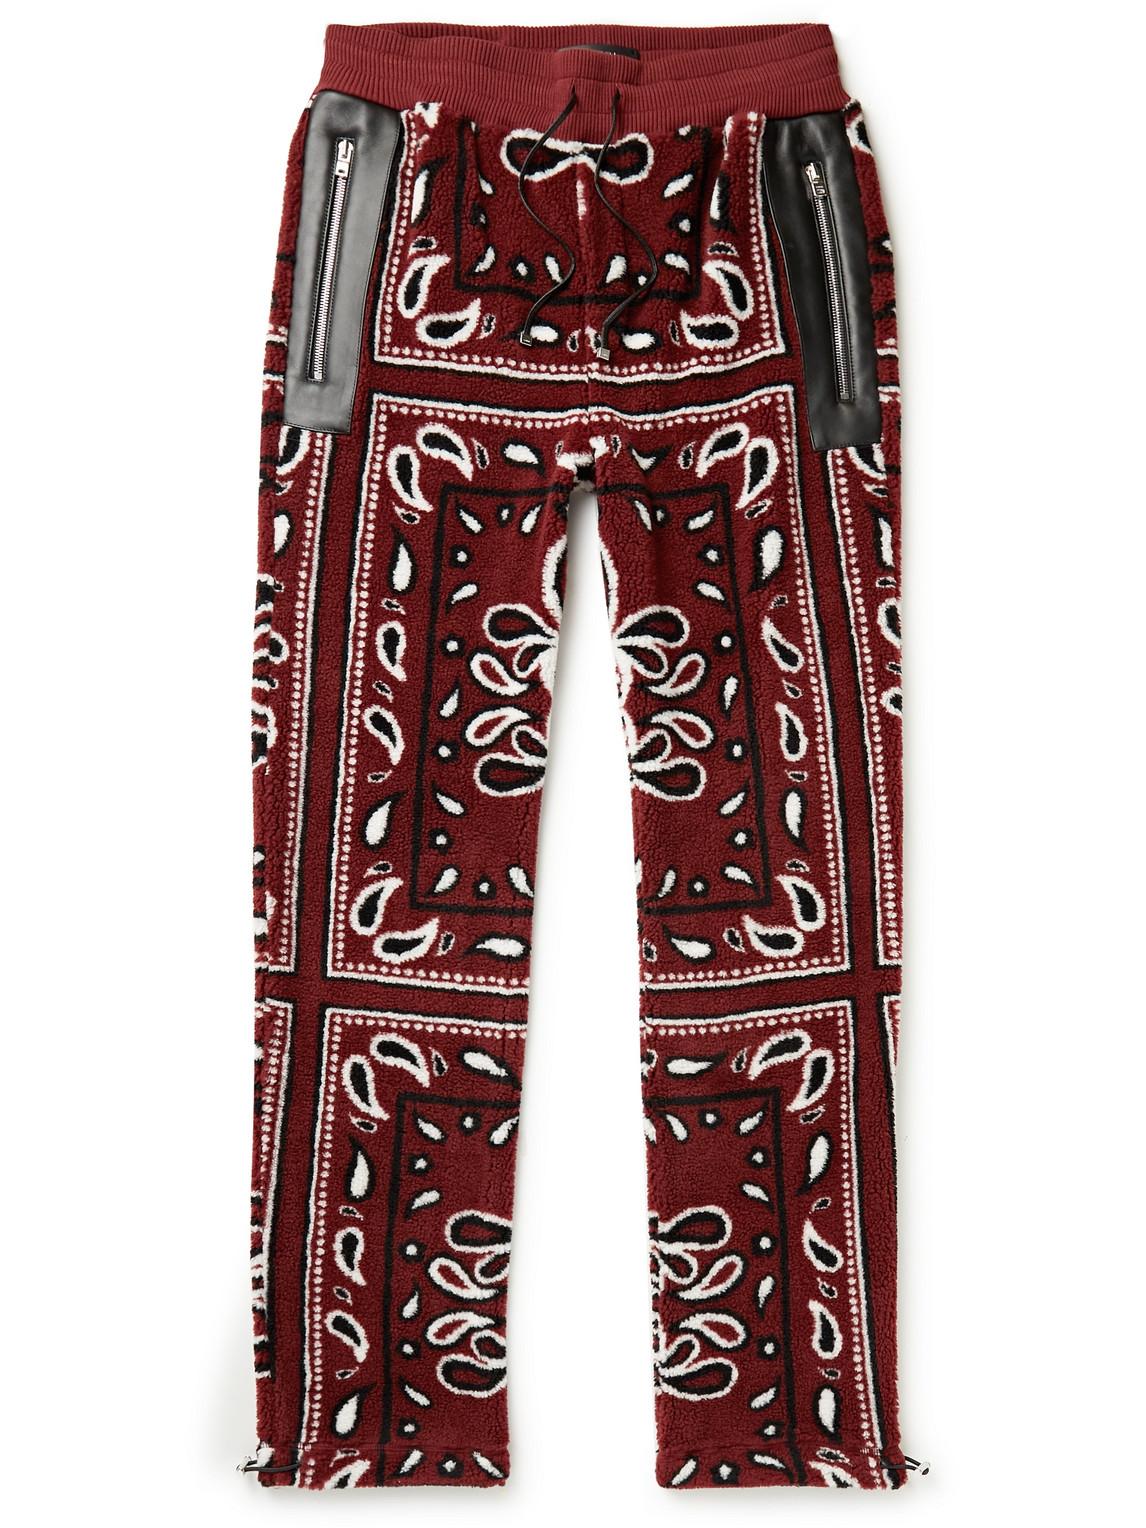 Straight-Leg Leather-Trimmed Bandana-Print Fleece Sweatpants